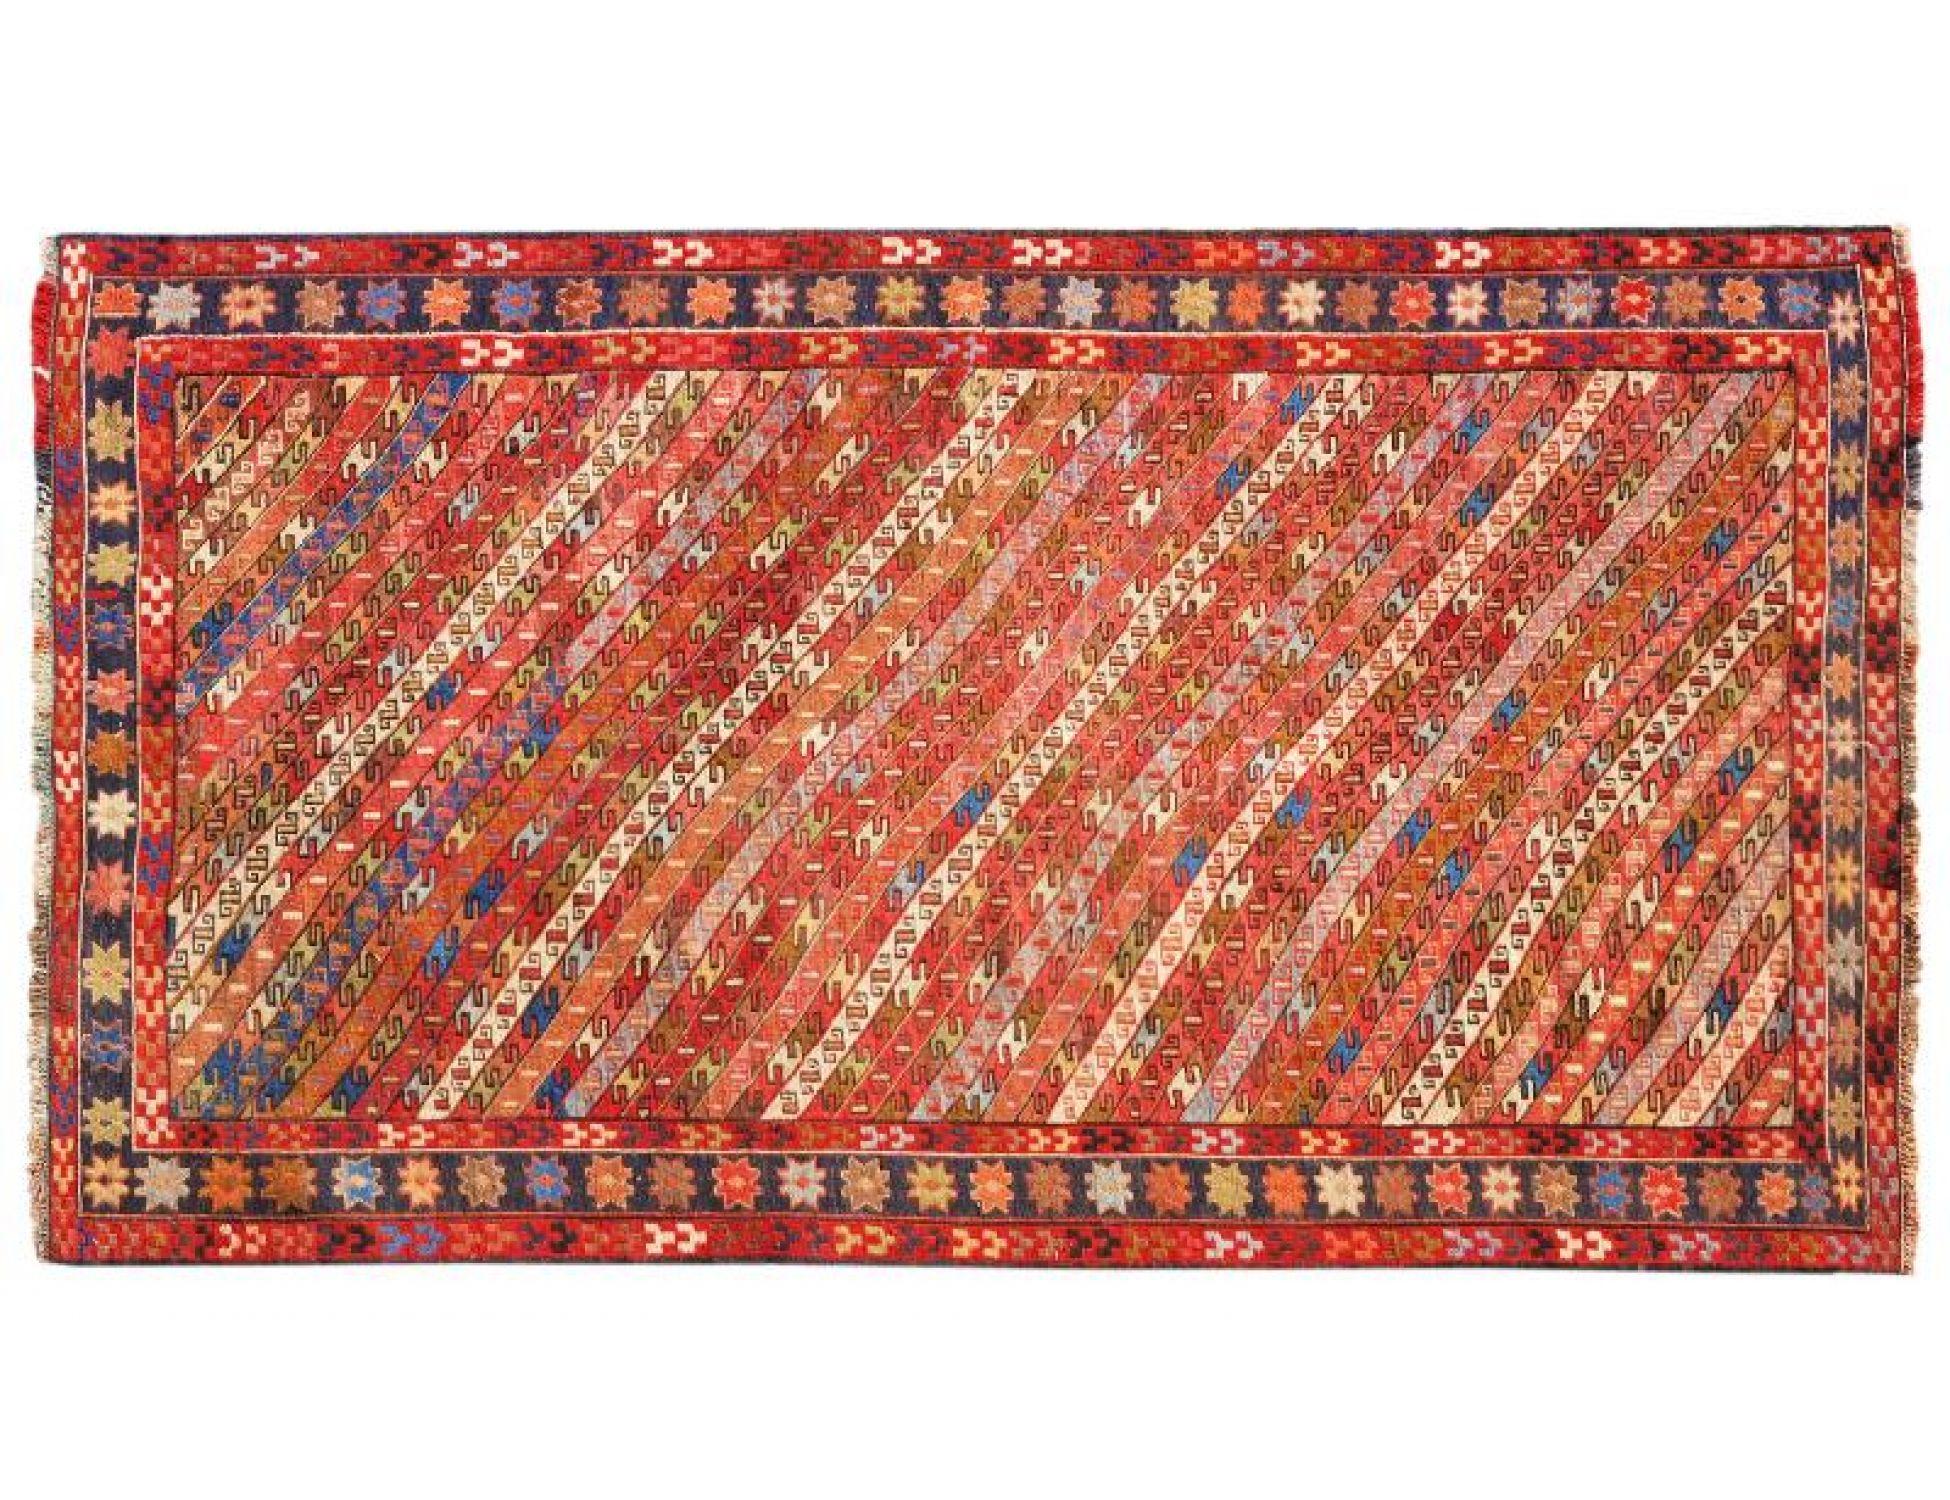 PERSIAN WOOL KILIMS   <br/>202 x 113 cm